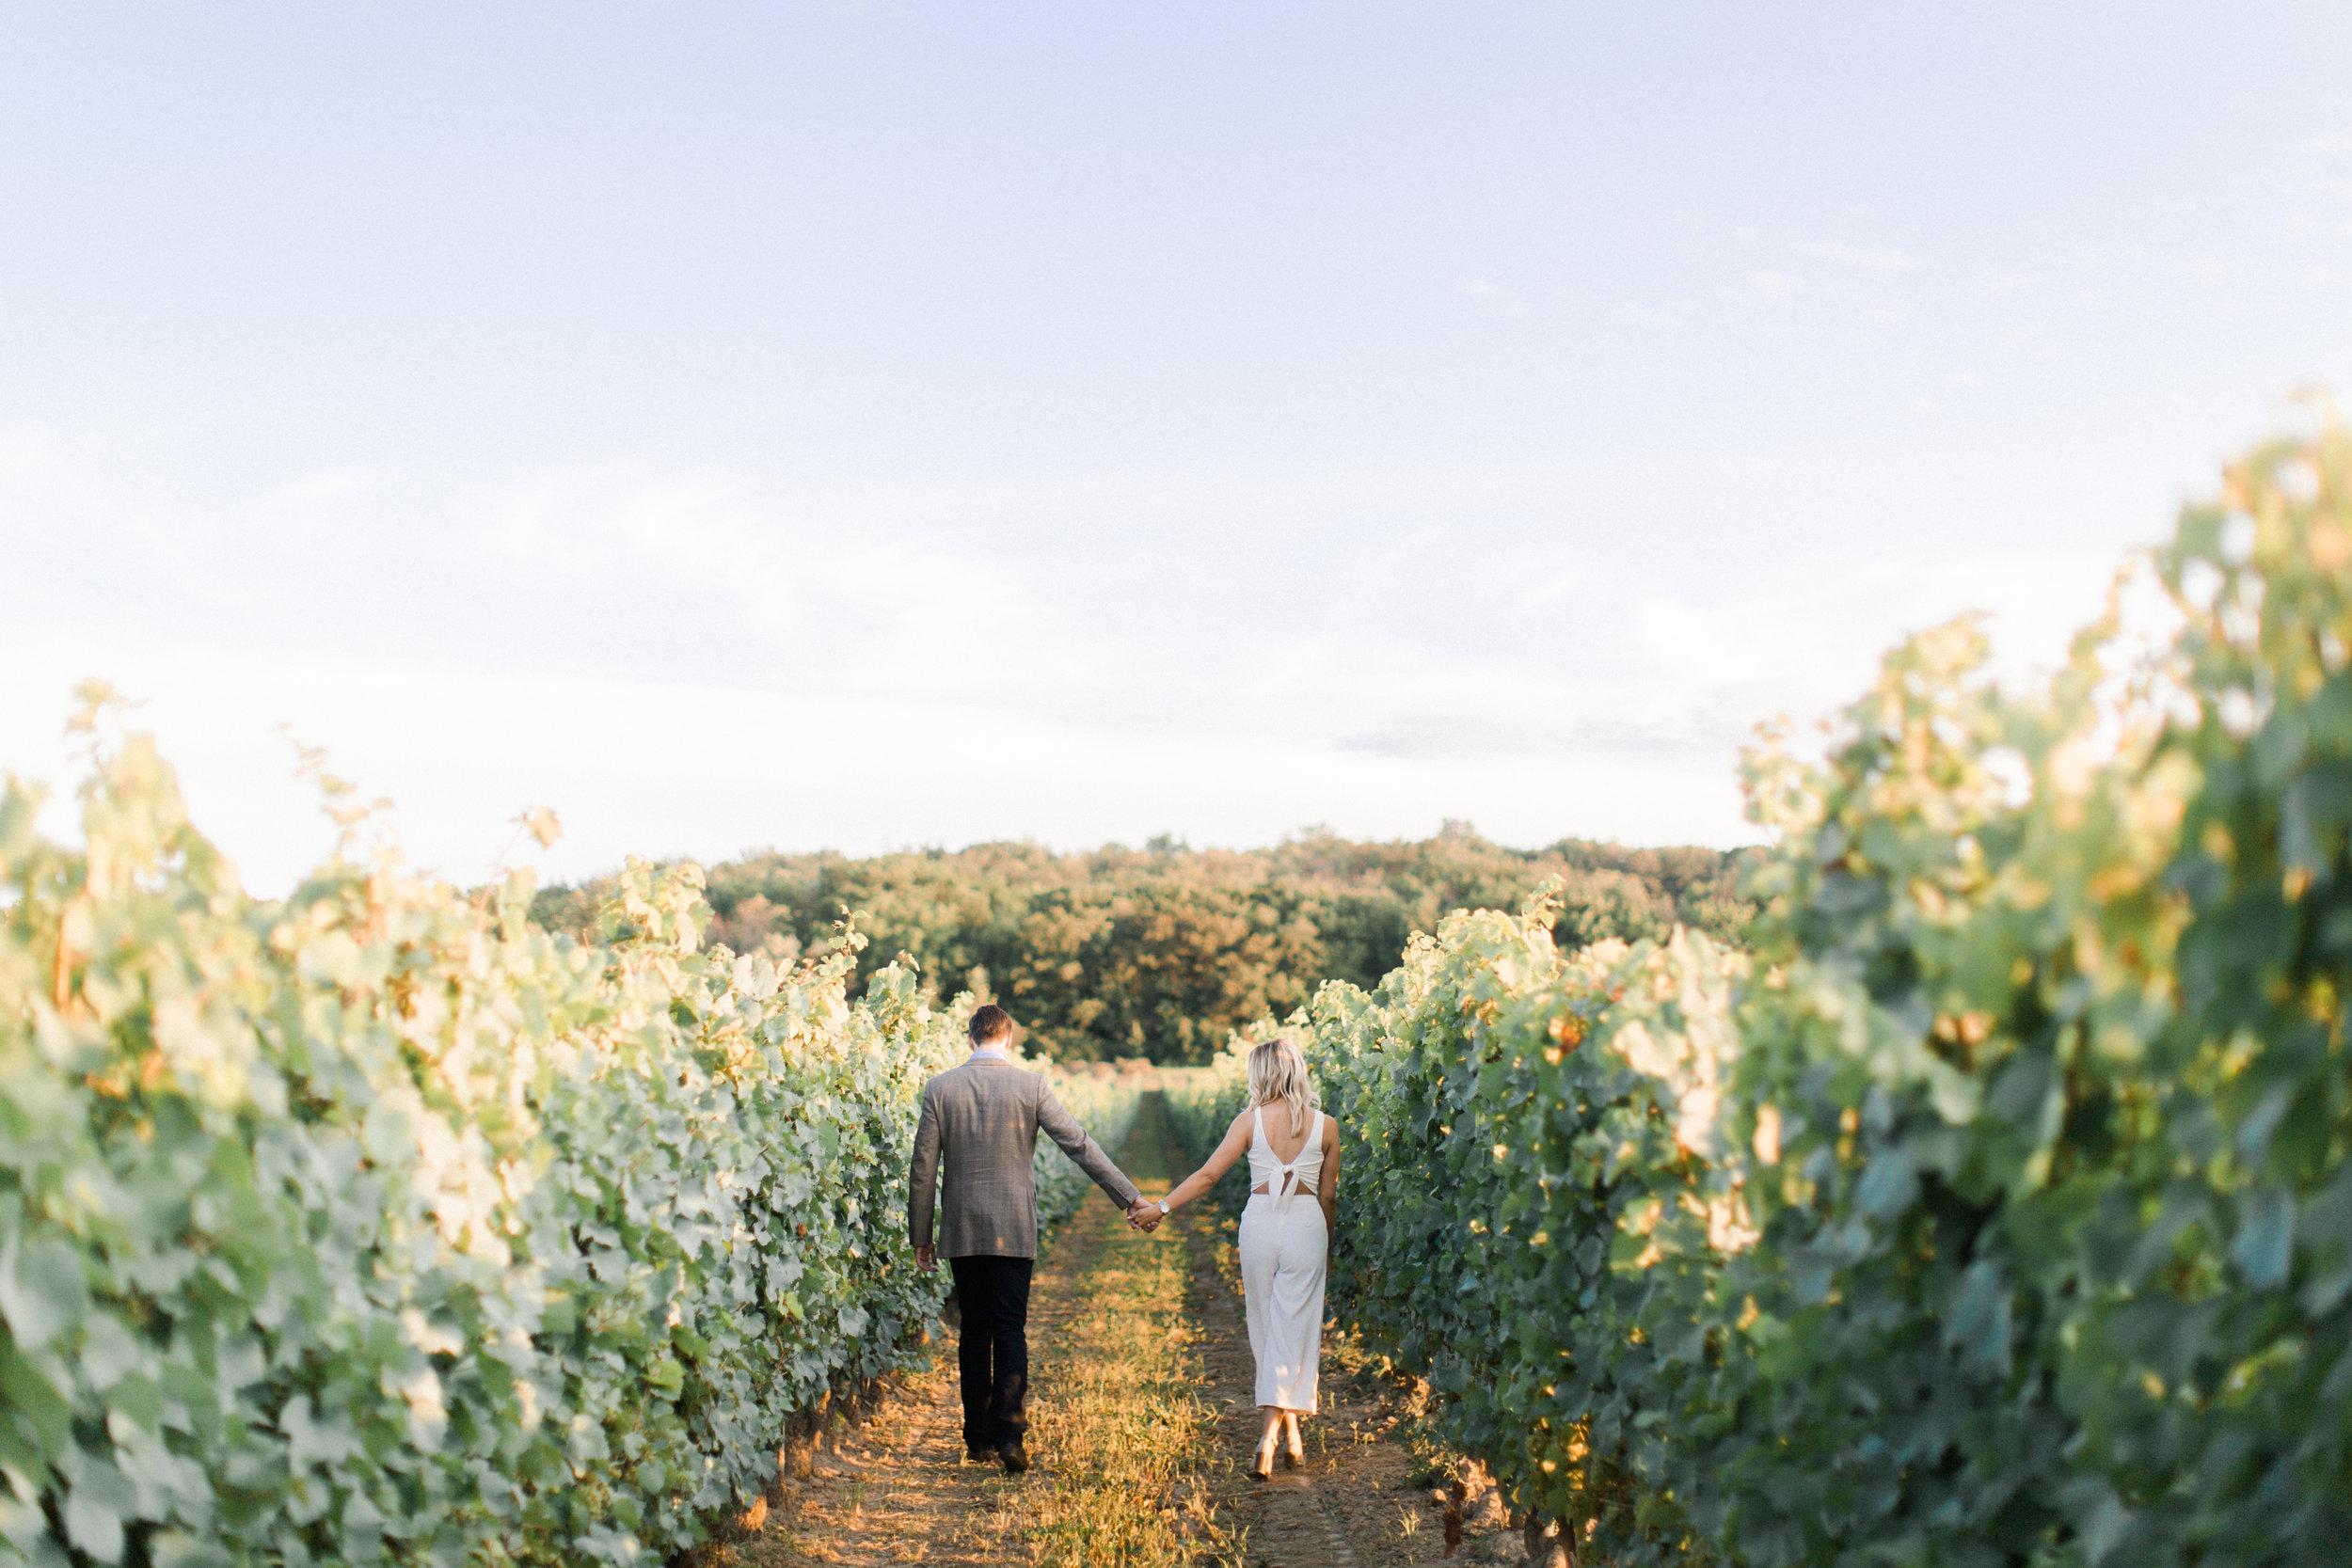 kurtz-orchard-gracewood-winery-wedding-photographer-richelle-hunter-sarah-jonathan-68.jpg